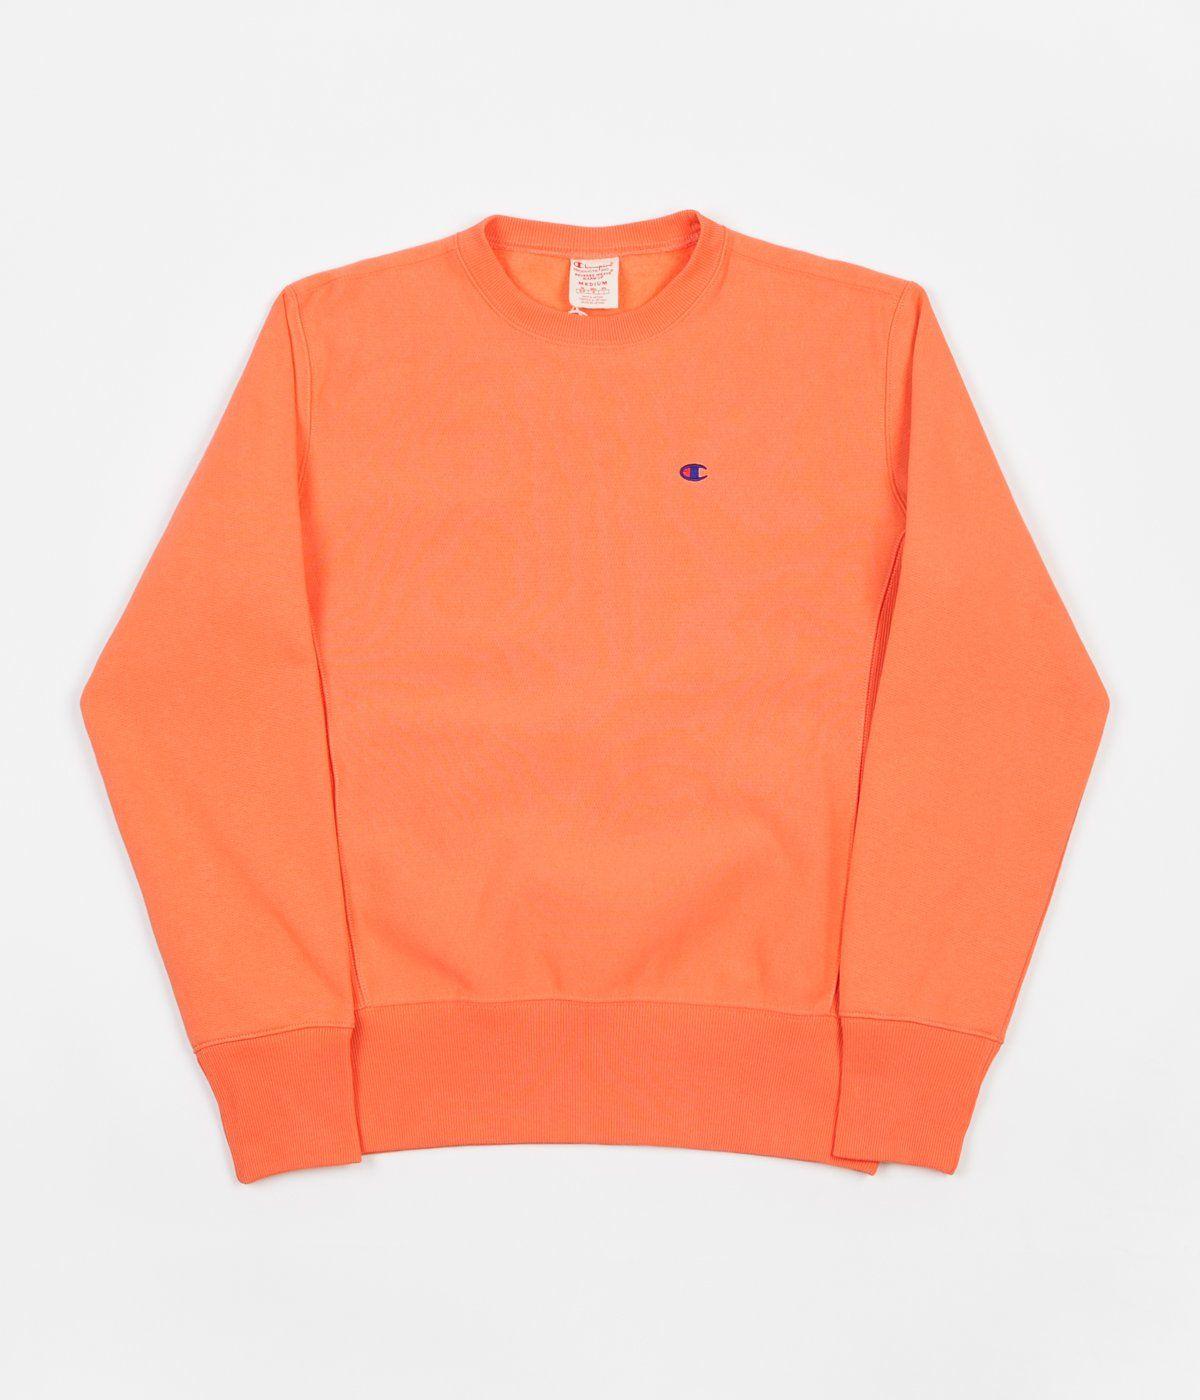 Champion Reverse Weave Classic Crewneck Sweatshirt Peach Champion Reverse Weave Crew Neck Sweatshirt Sweatshirts [ 1400 x 1200 Pixel ]